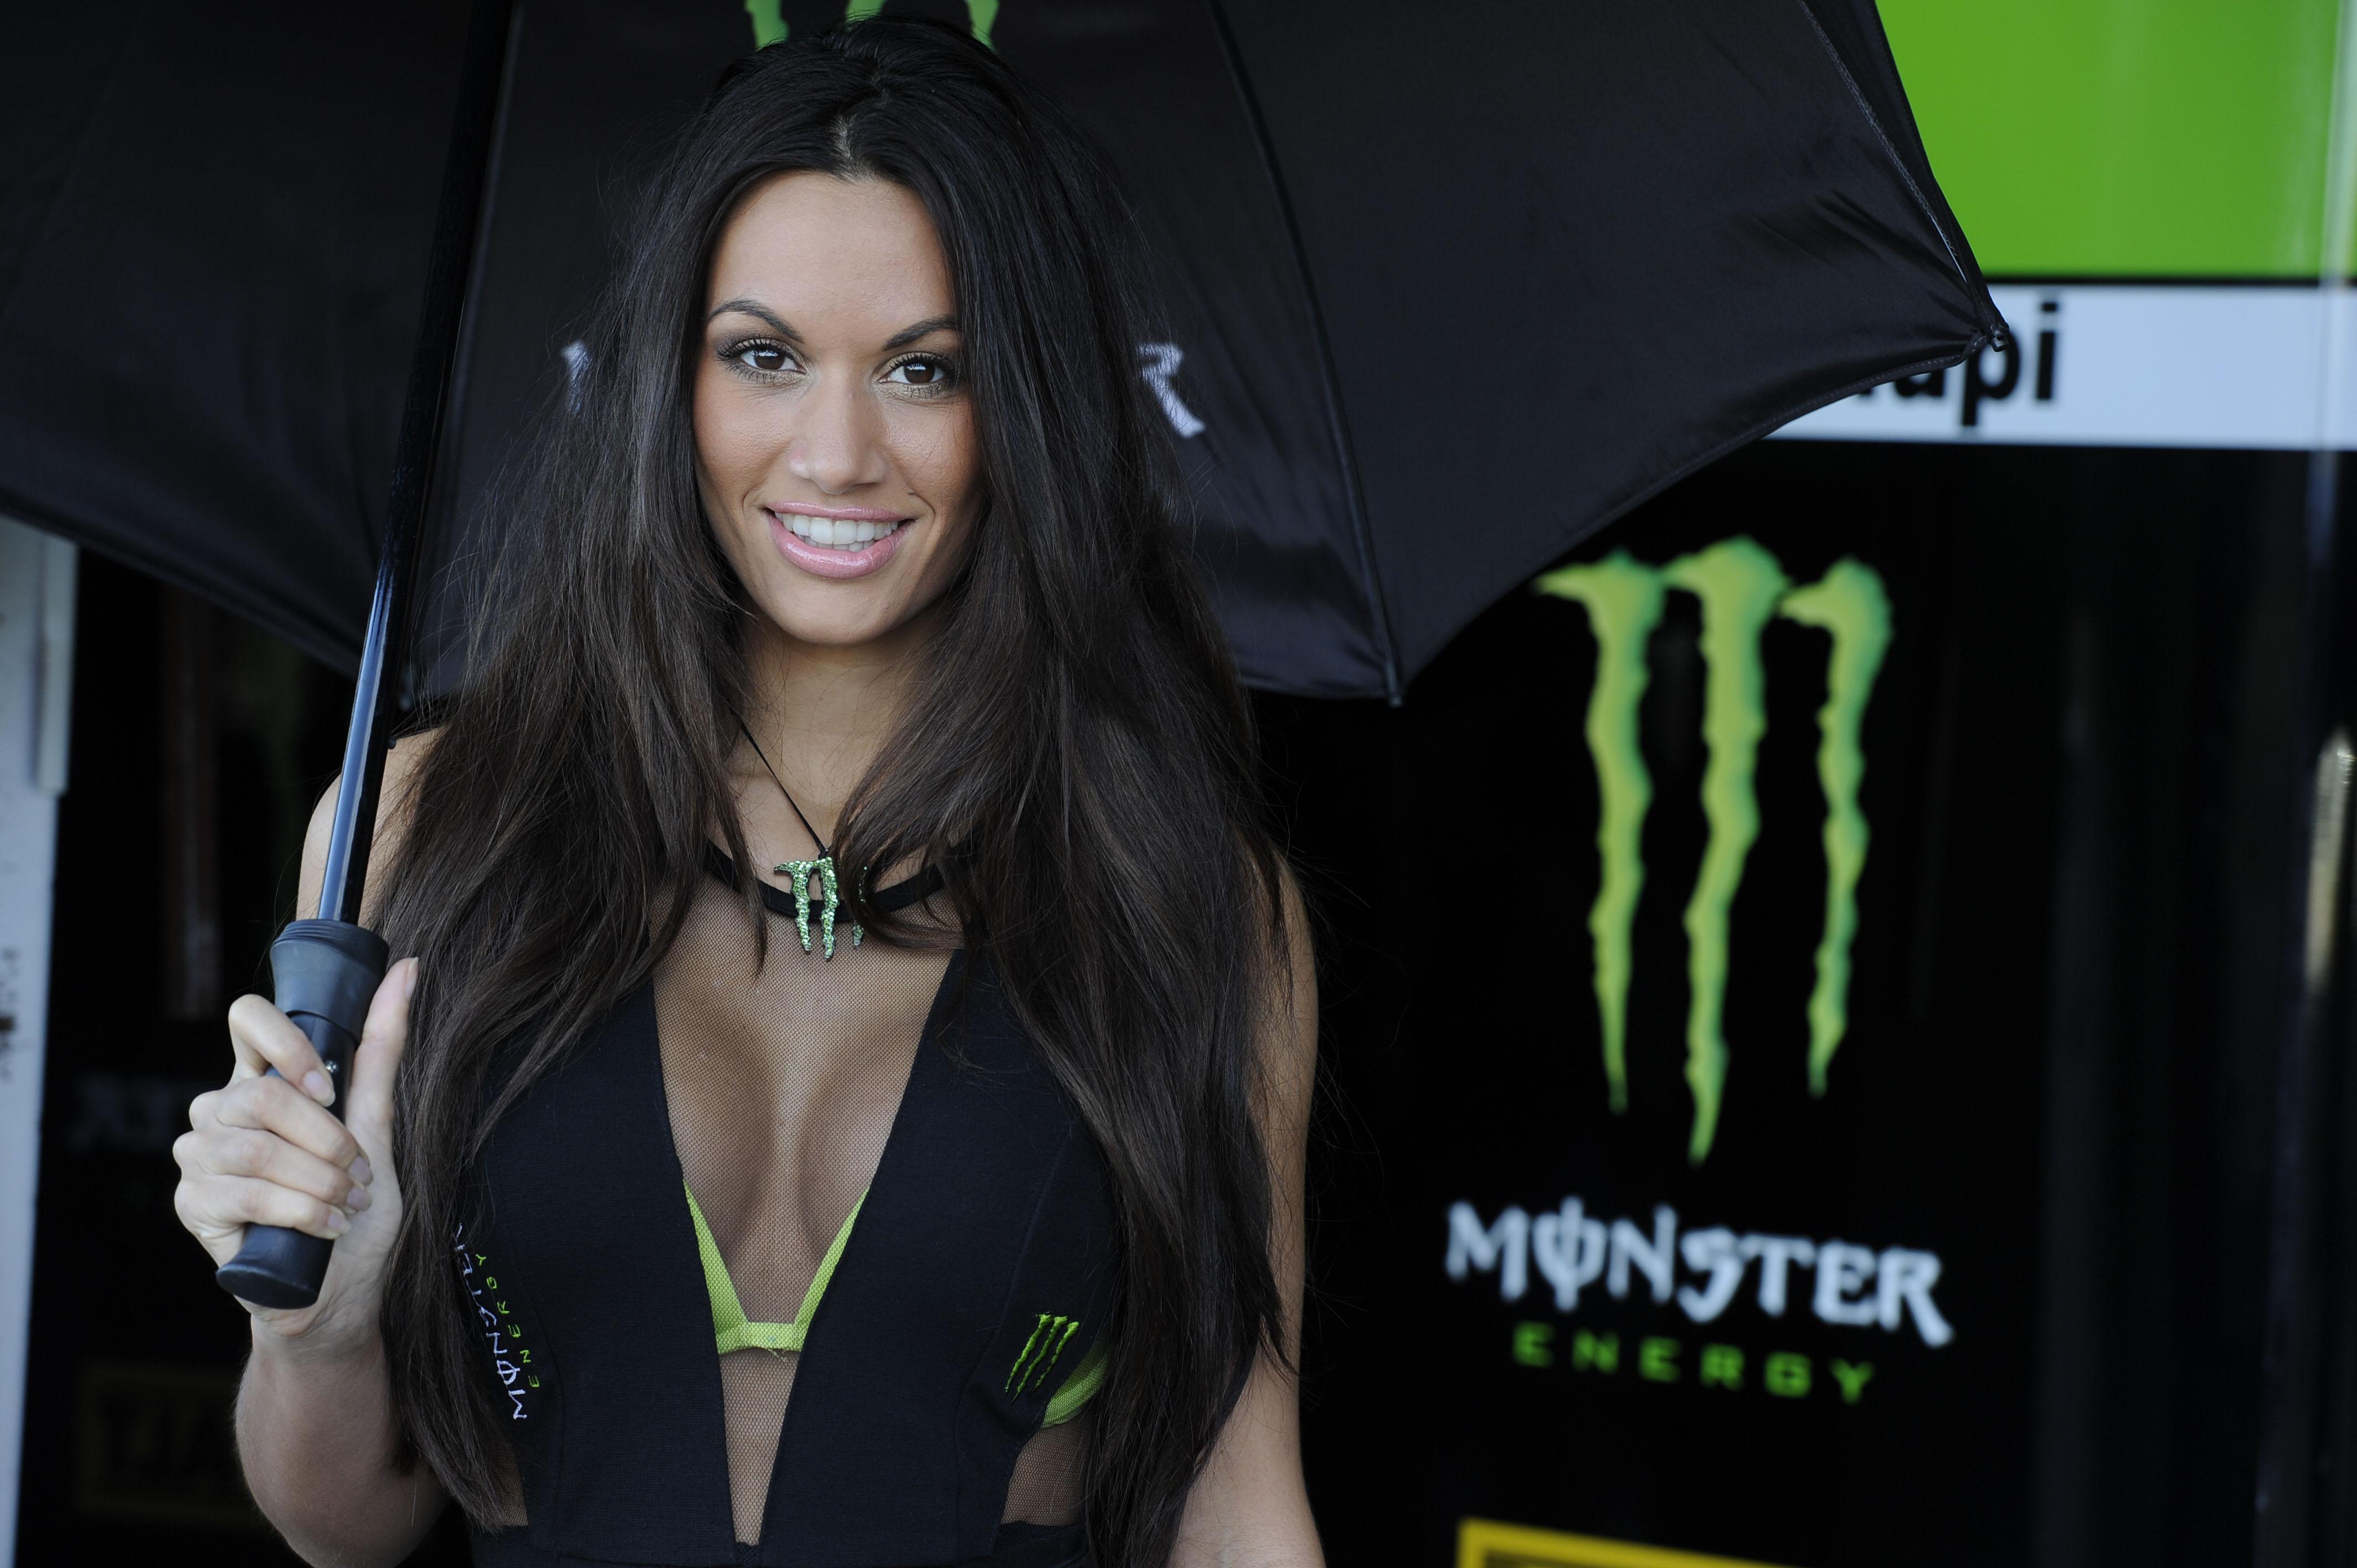 MotoGP grid girl pictures Valencia 2012 | Visordown